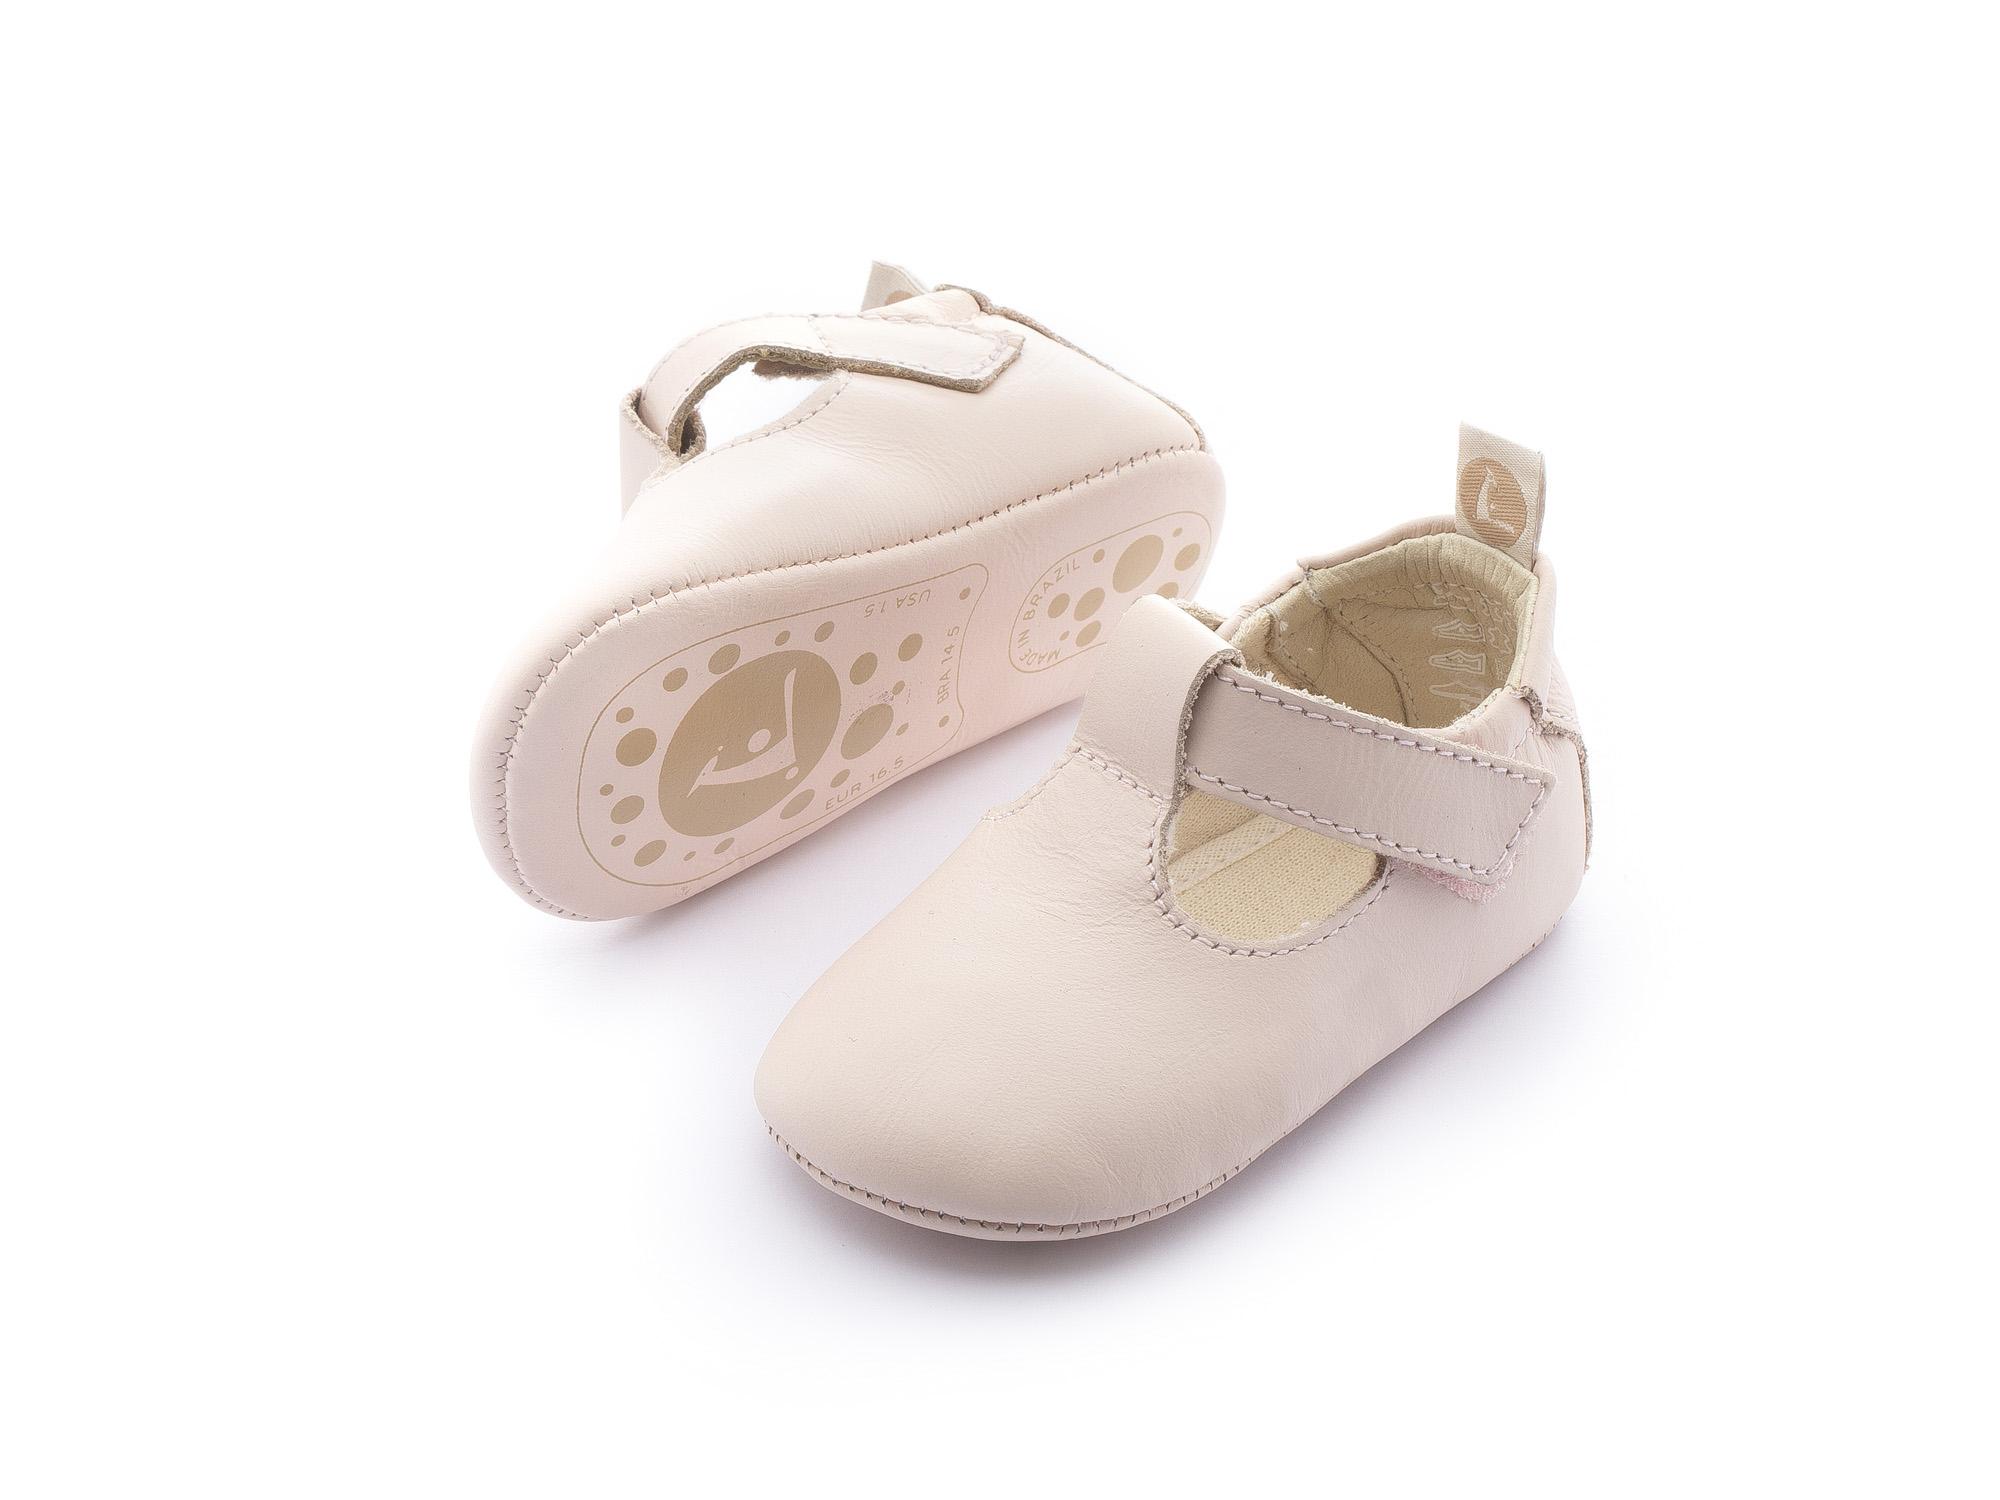 Boneca Love Cotton Candy Baby 0 à 2 anos - 2